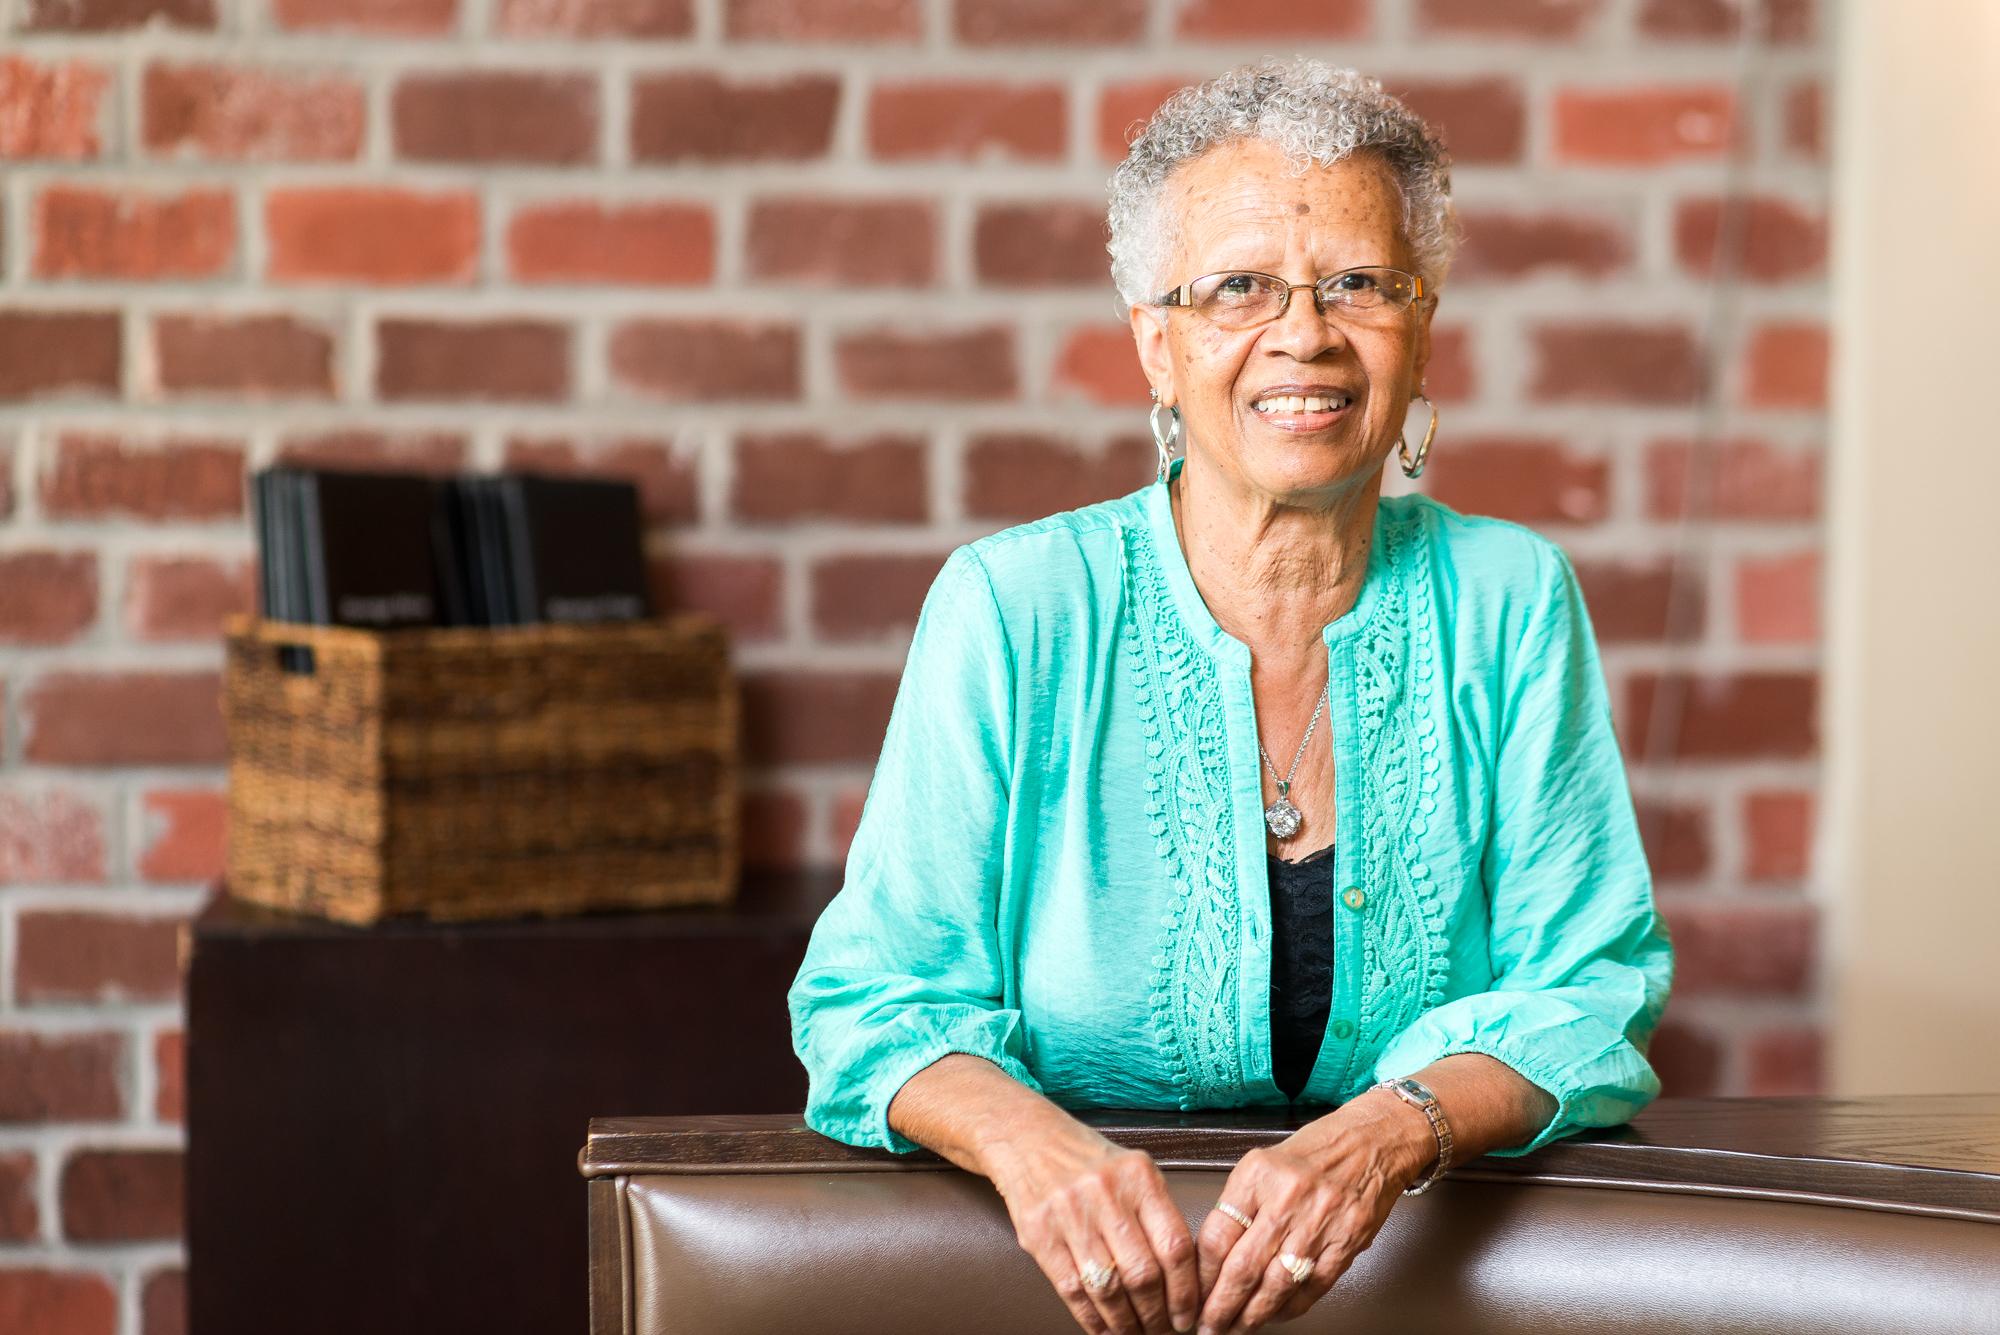 Lorraine Singleton of Nage